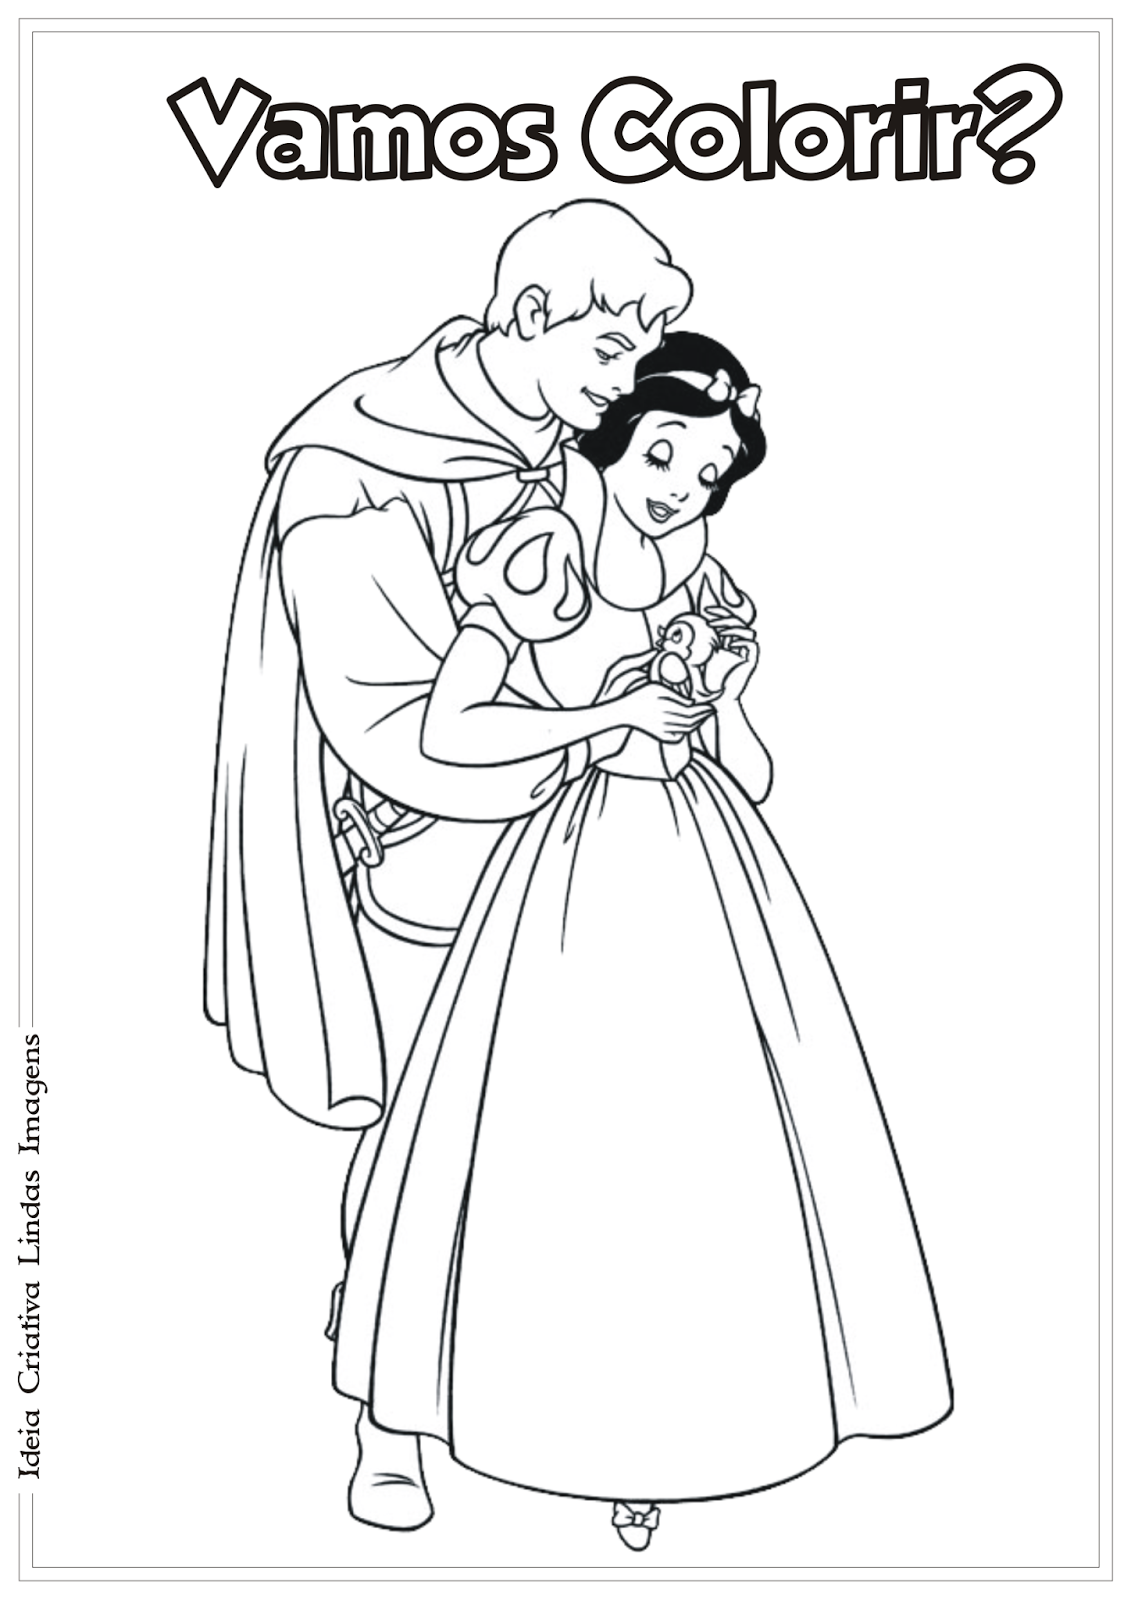 Branca de Neve desenho para colorir